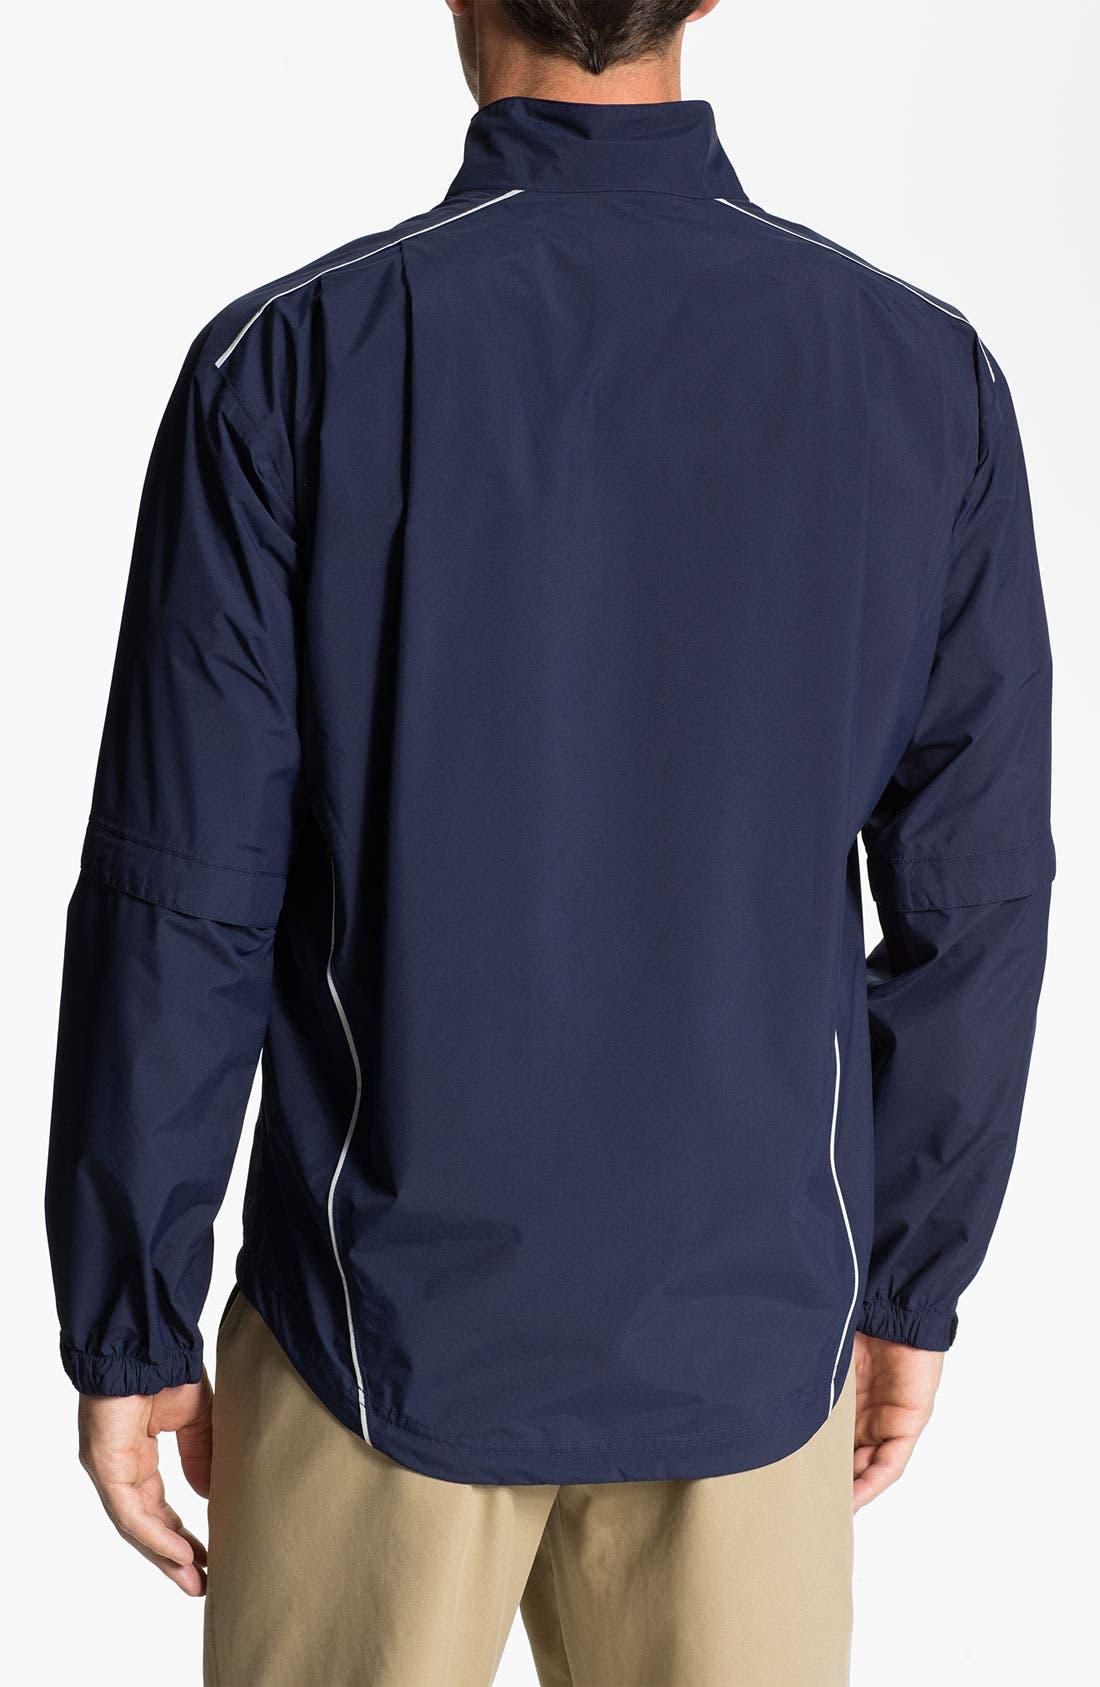 Alternate Image 2  - Zero Restriction Packable Jacket